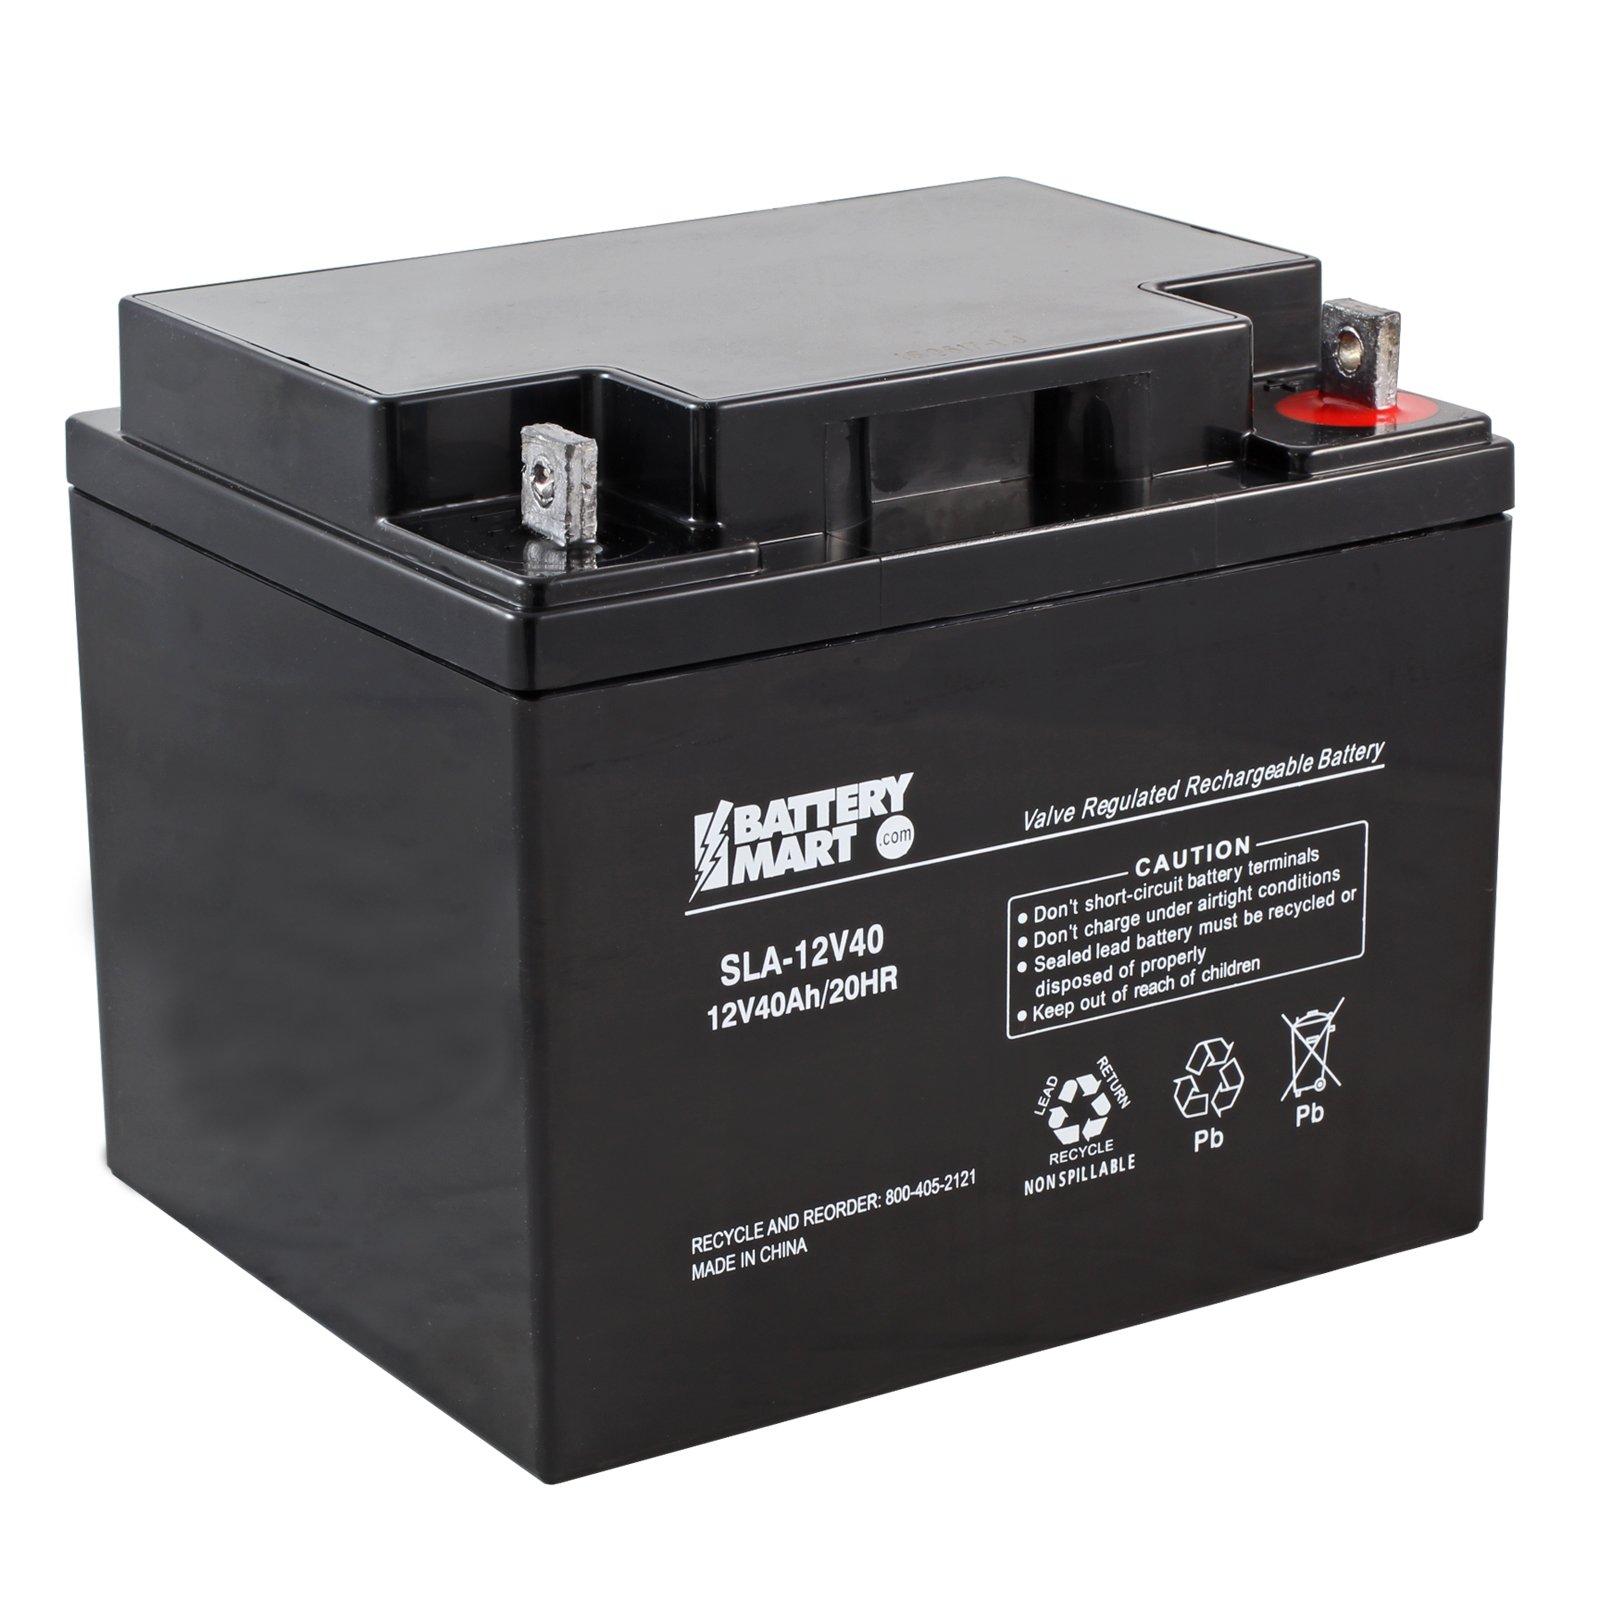 12 Volt 40 Ah Sealed Lead Acid Rechargeable Battery Nut